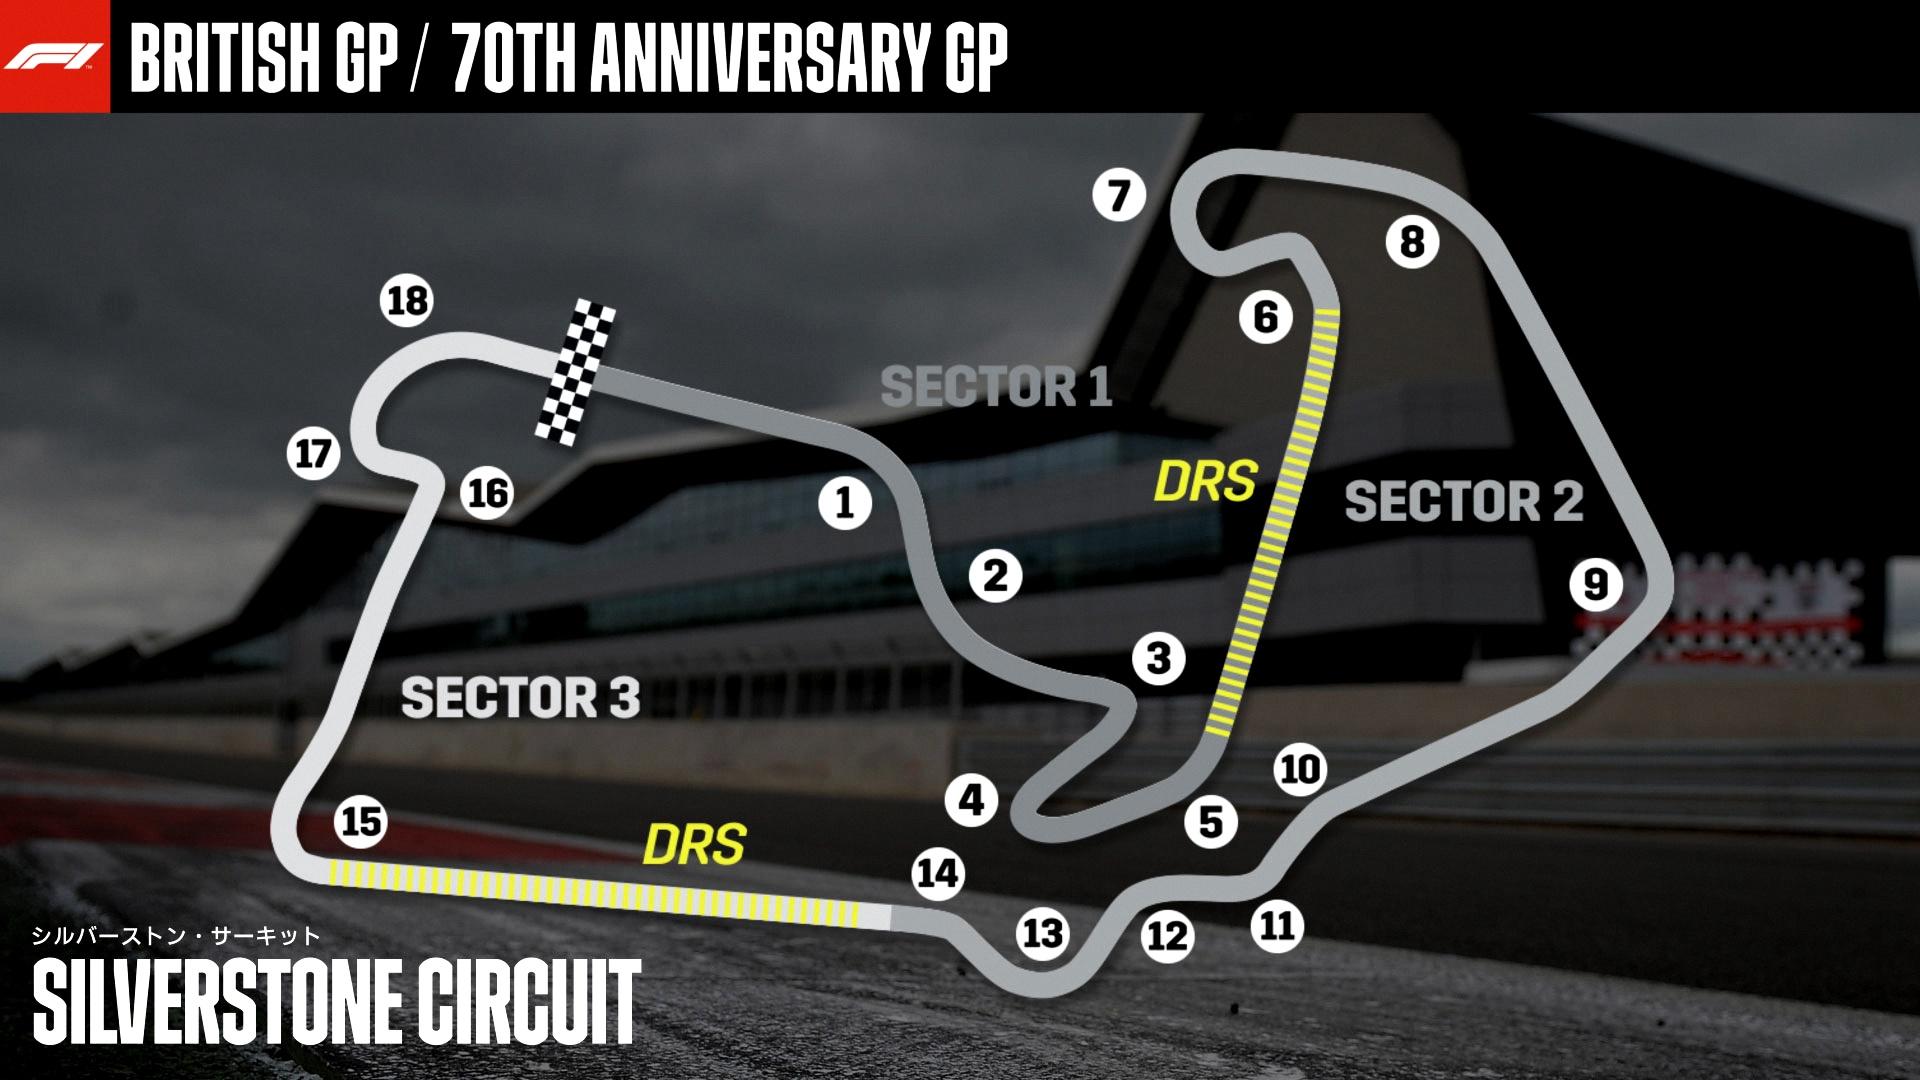 2020-07-16 Silverstone Formula 1 F1 British